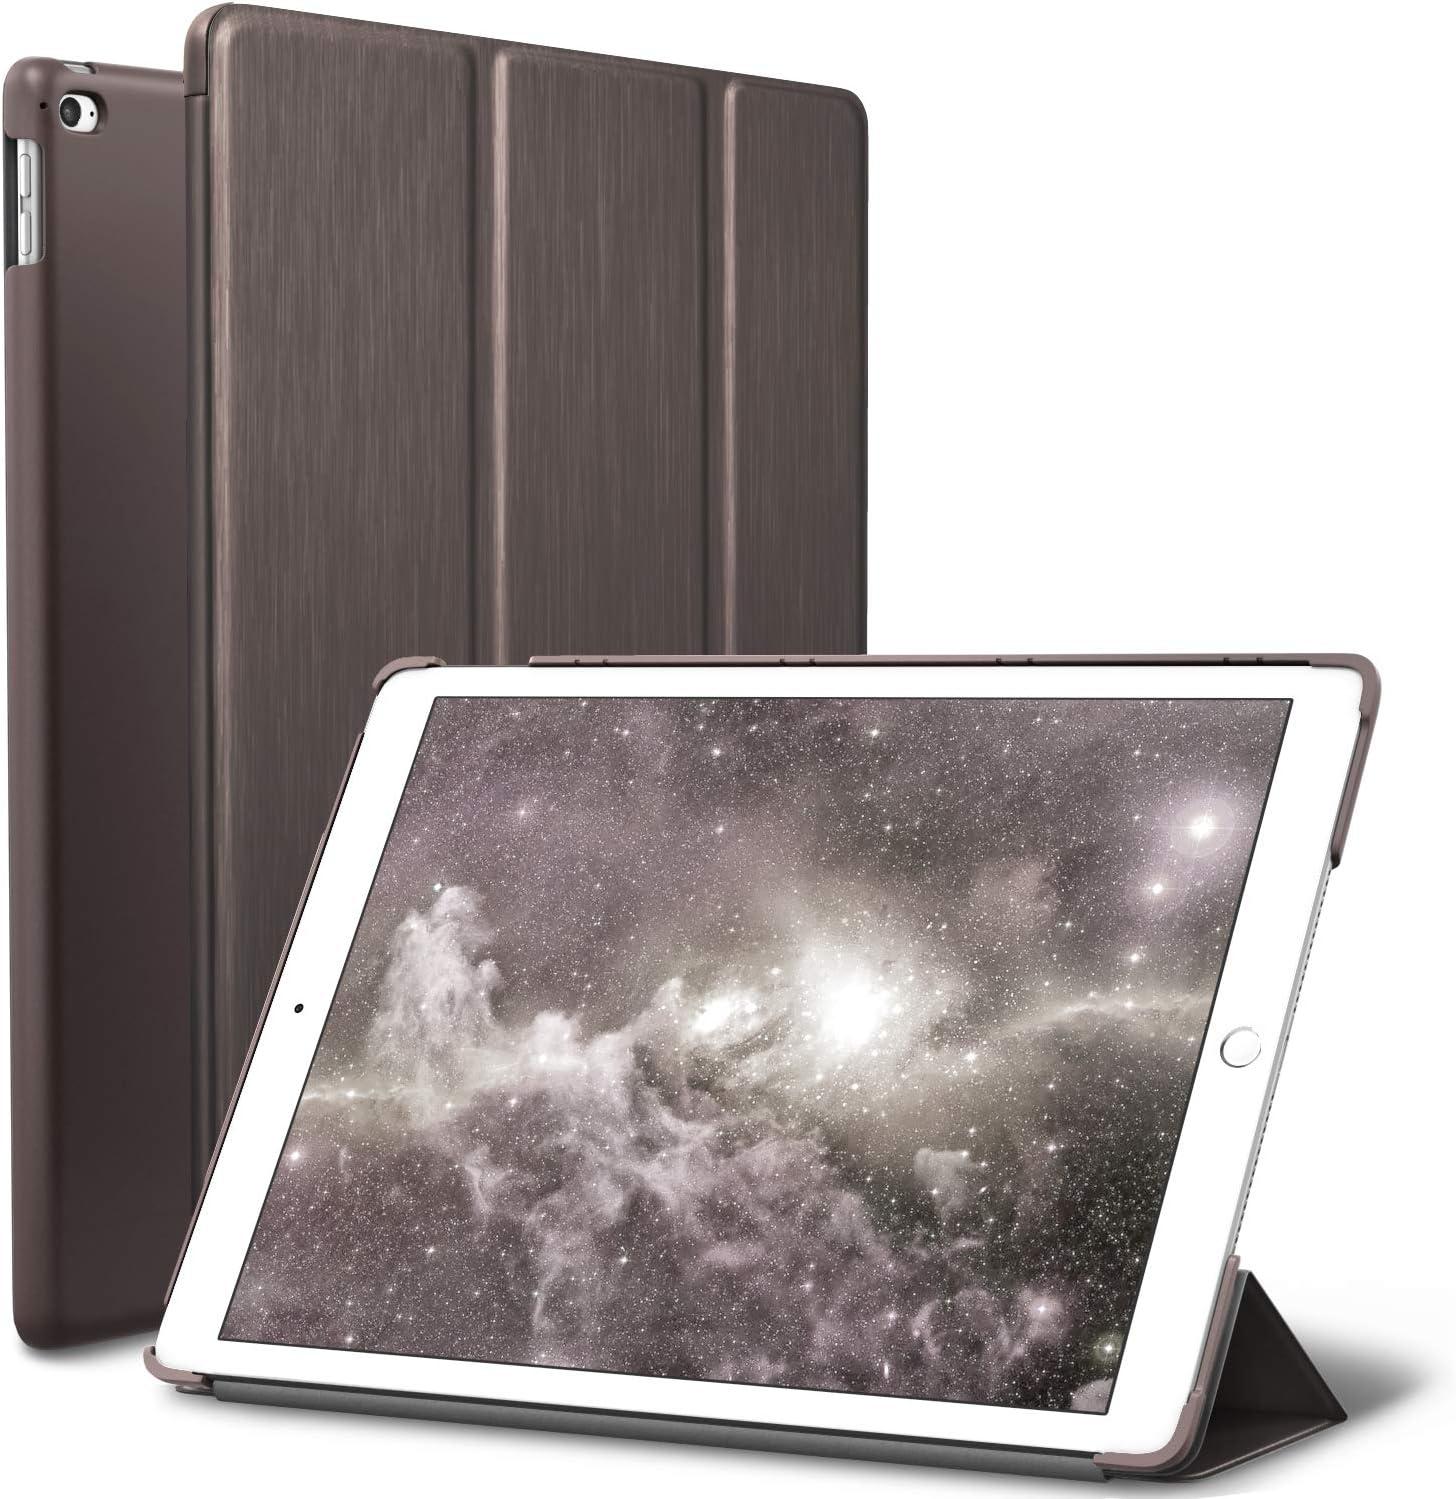 iPad Mini 4 case, ROARTZ Metallic Brown Slim Fit Smart Rubber Coated Folio Case Hard Cover Light-Weight Auto Wake/Sleep for Apple iPad Mini 4th Generation Model A1538/A1550 Retina Display